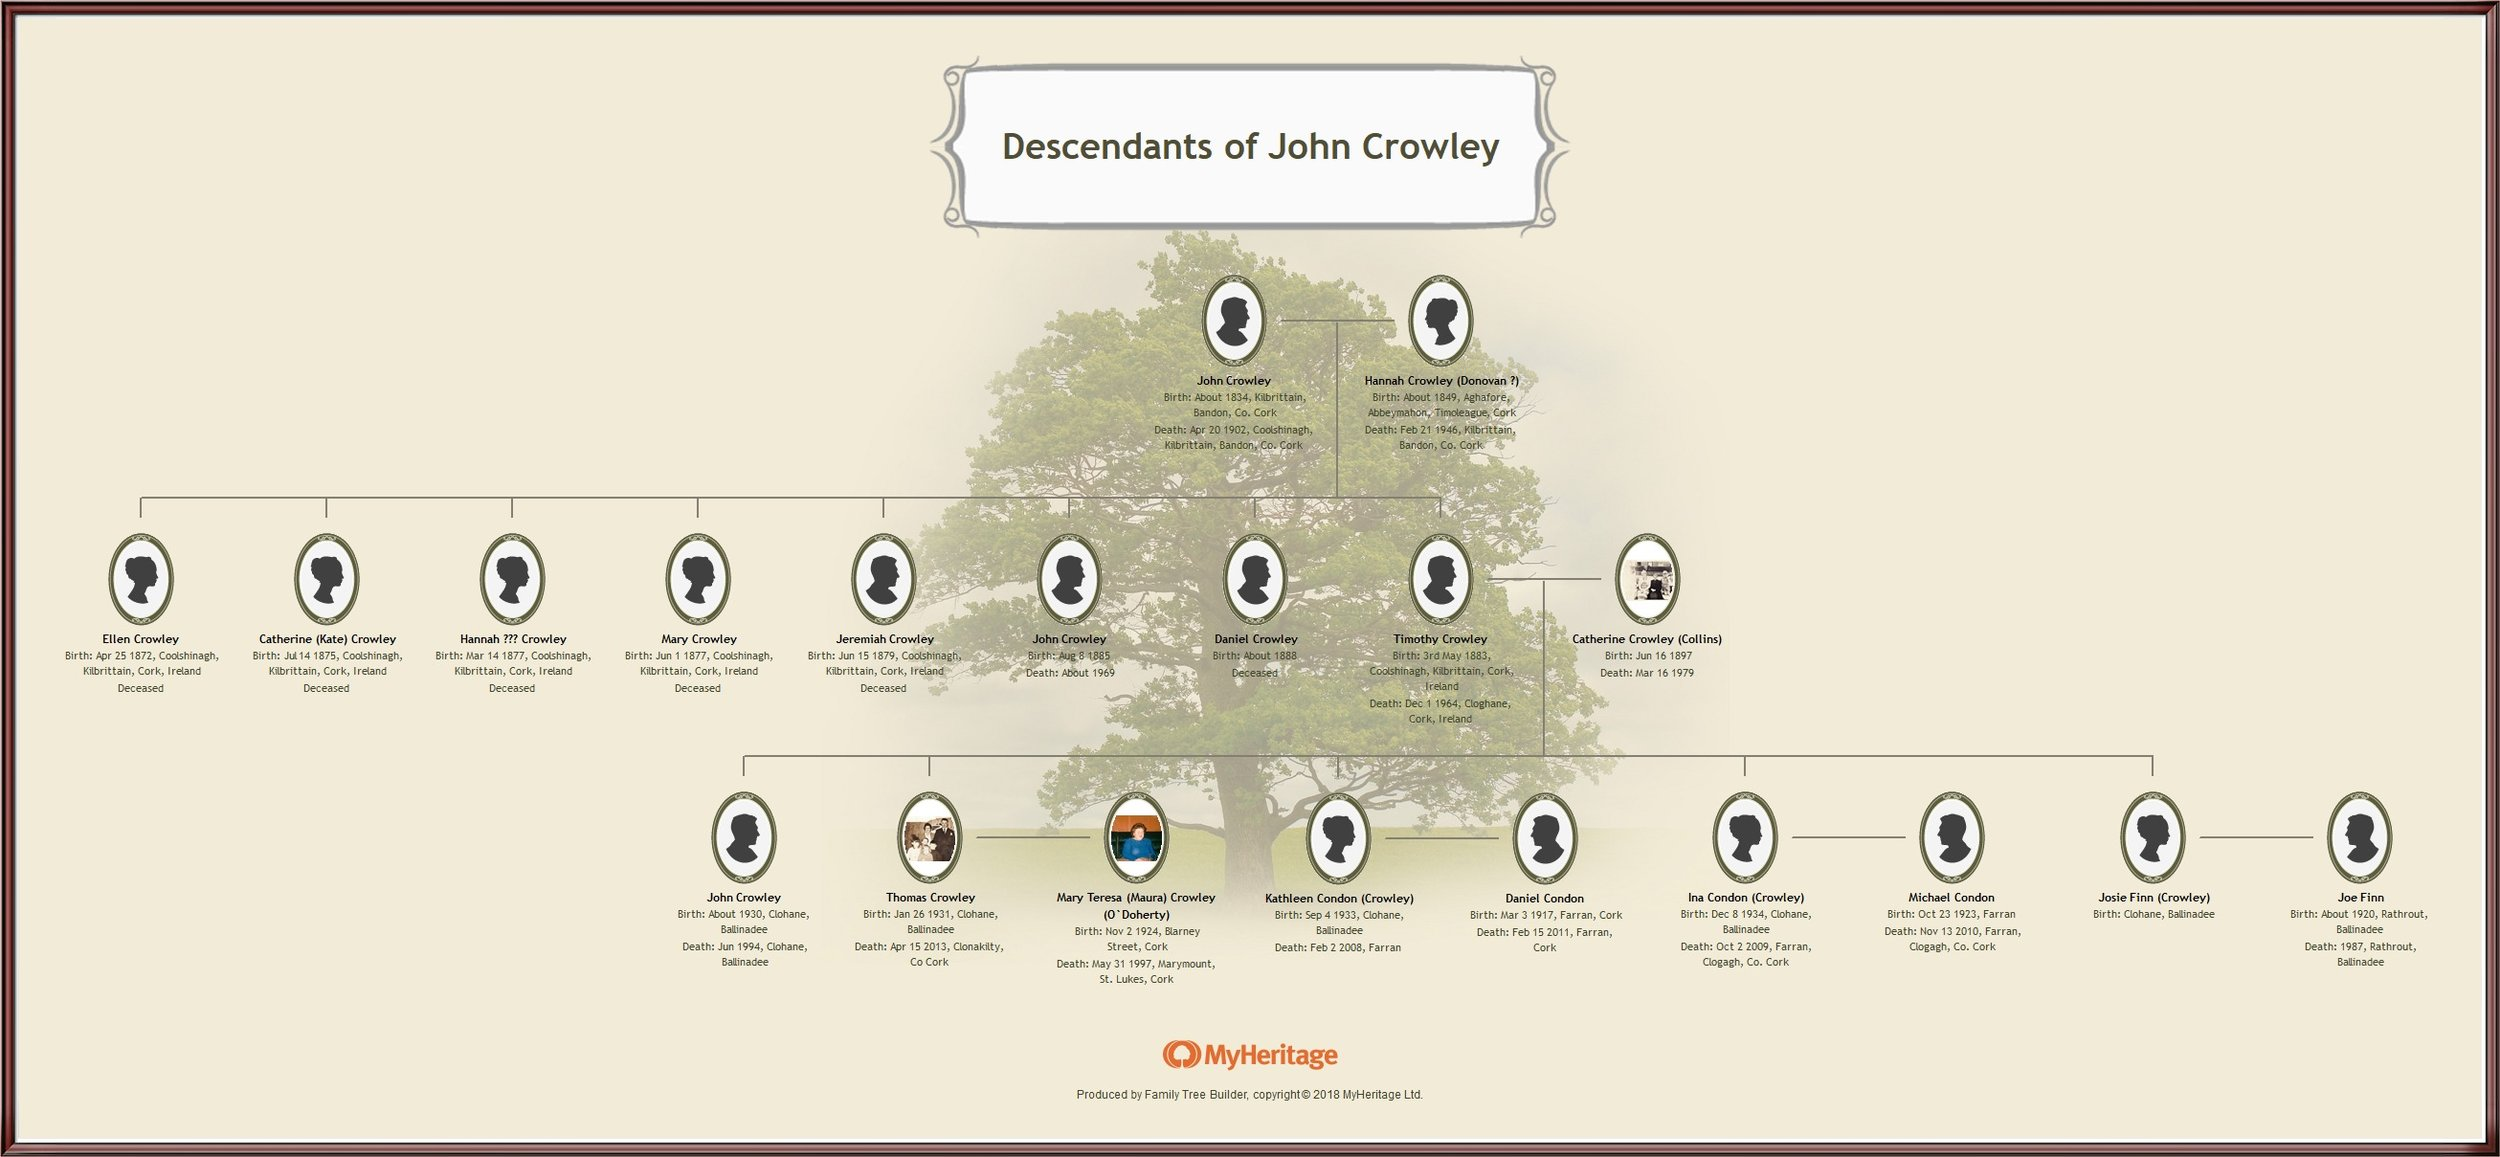 Descendants of John Crowley.JPG